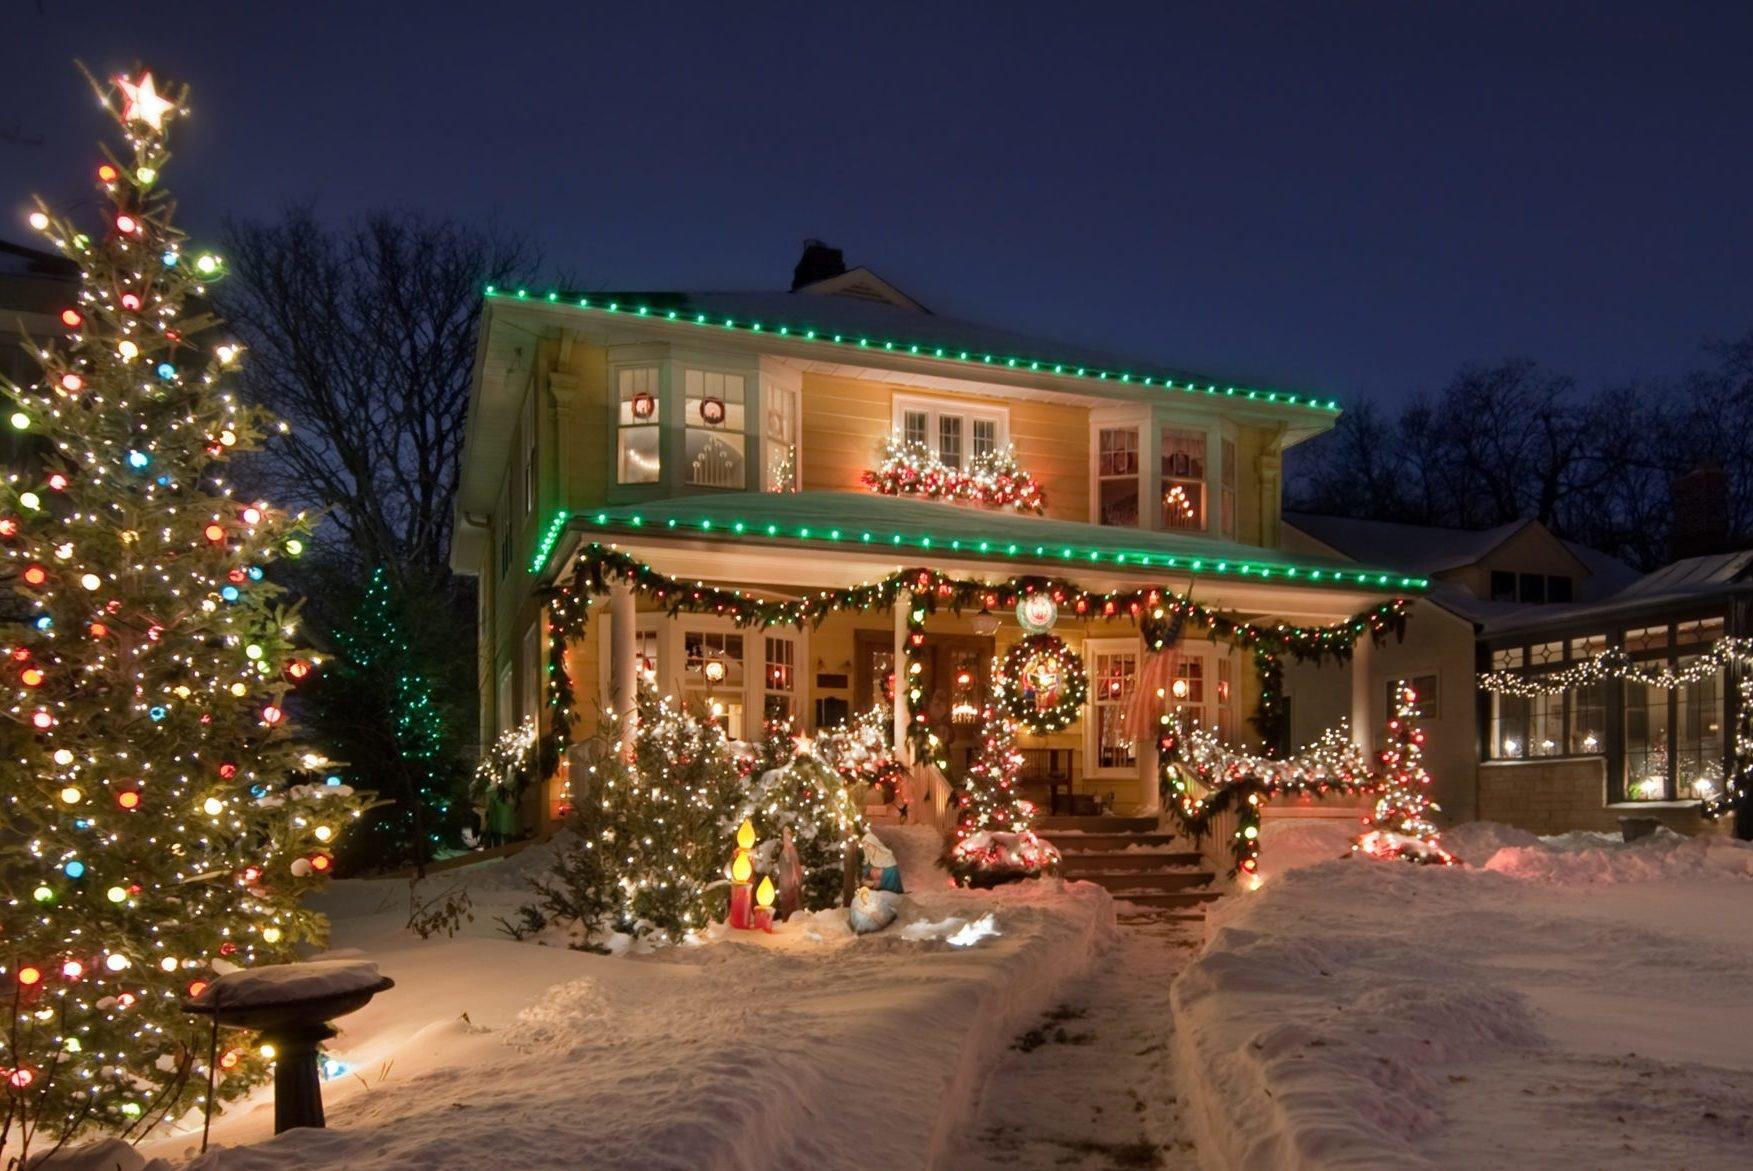 Best Outdoor Christmas Lights For The Best Neighborhood Display Reader S Digest